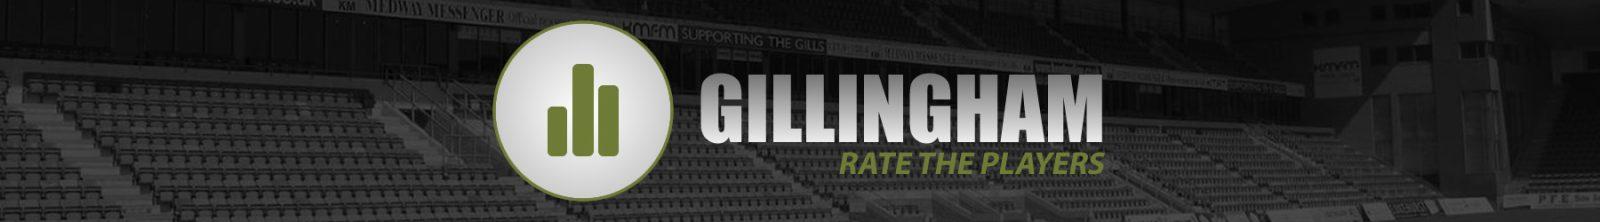 Rate Gillingham